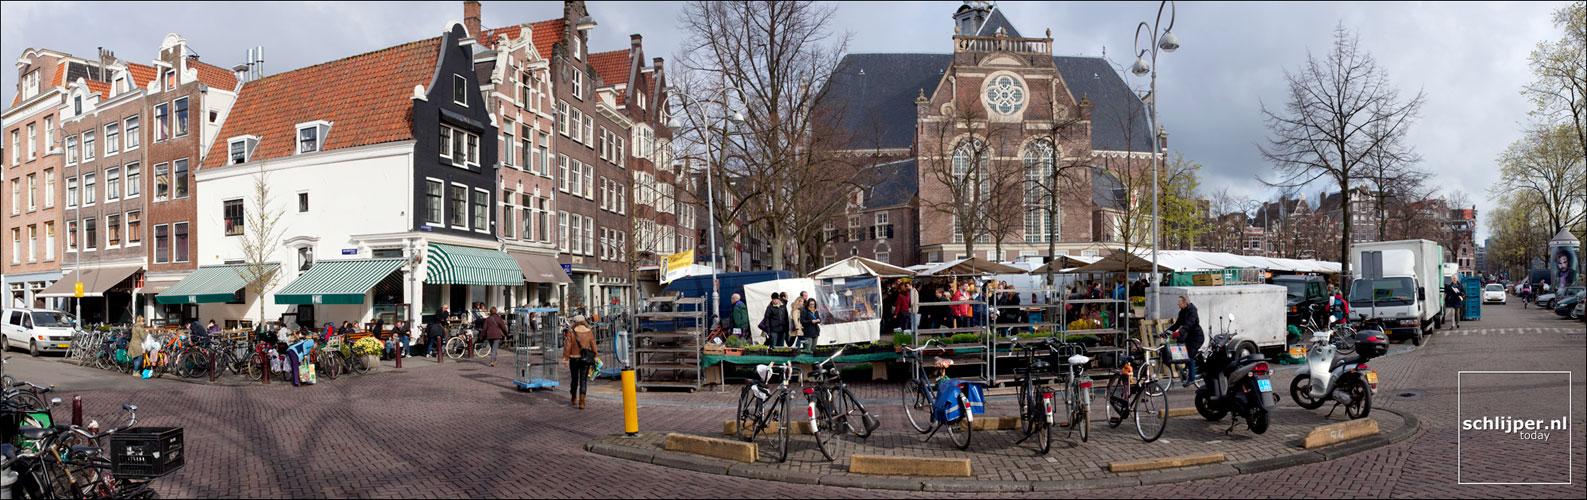 Nederland, Amsterdam, 7 april 2012